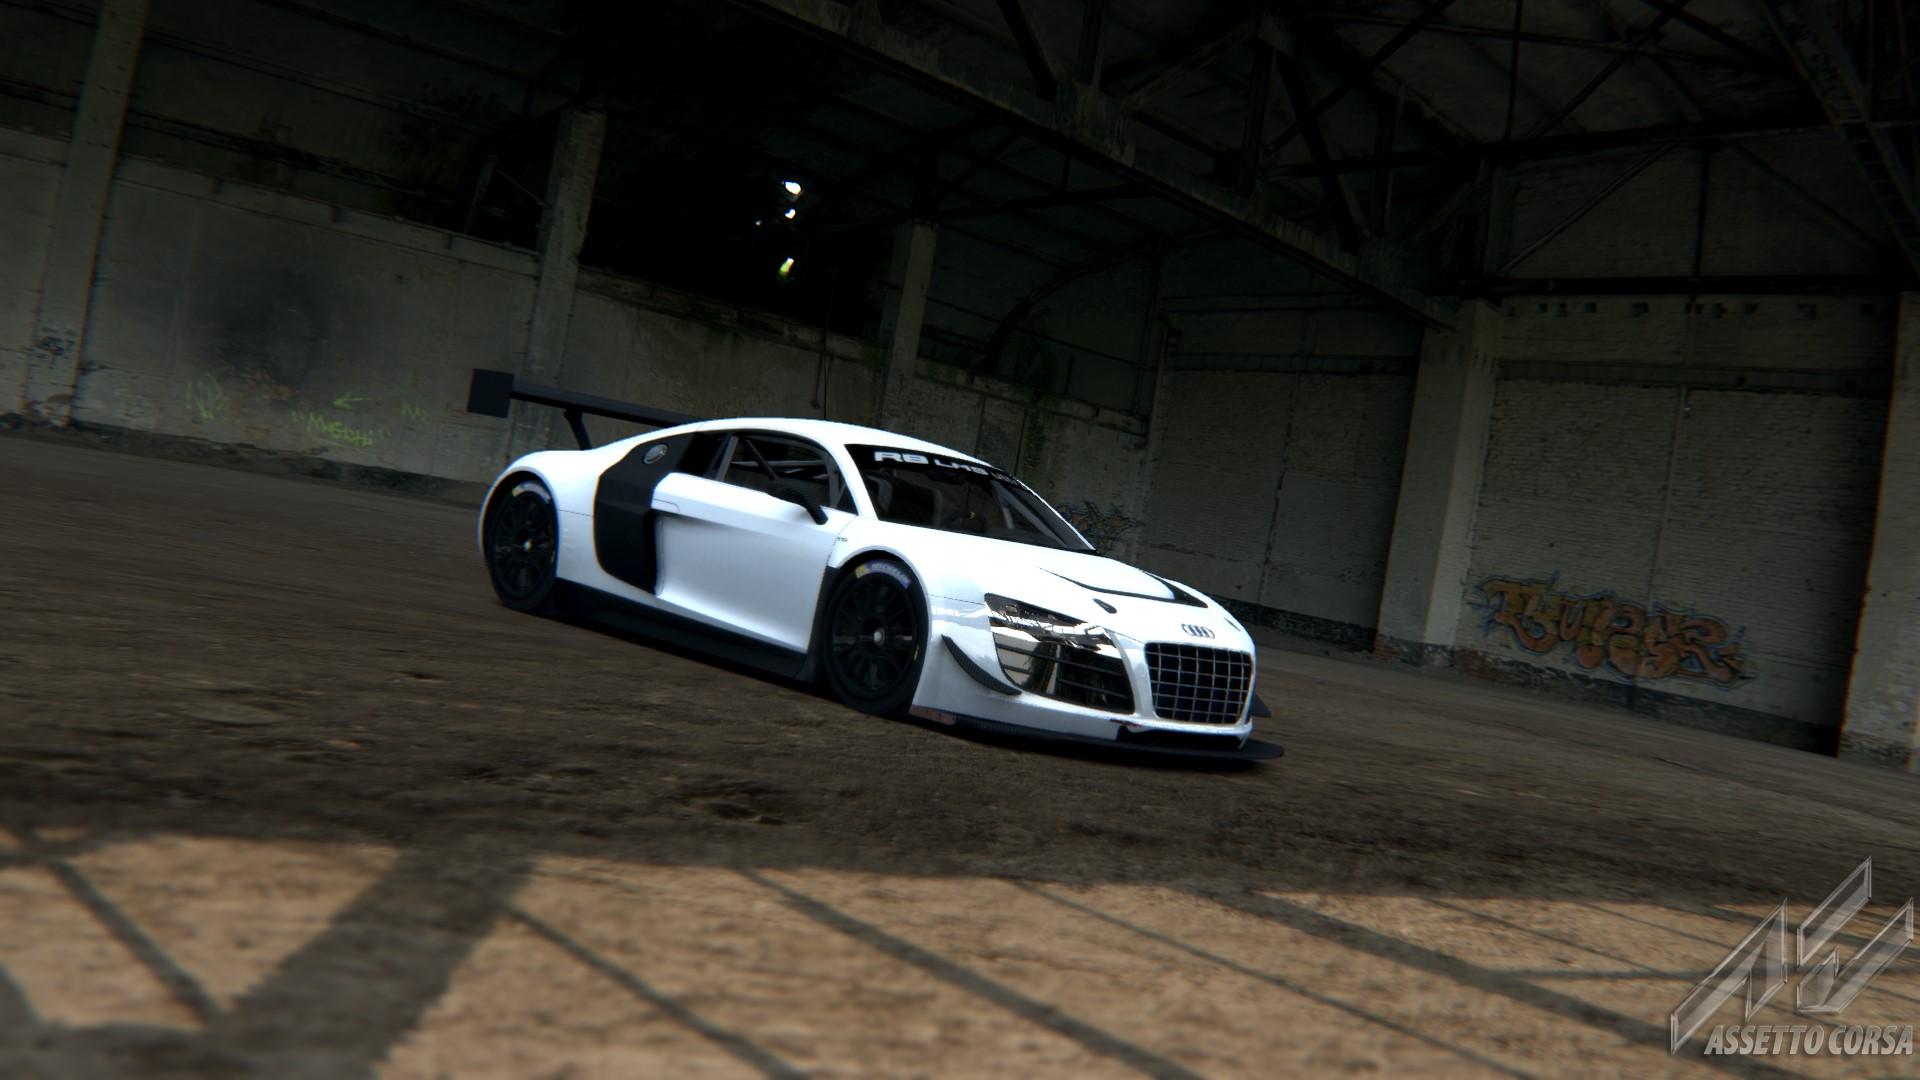 Assetto Corsa Audi R8 LMS